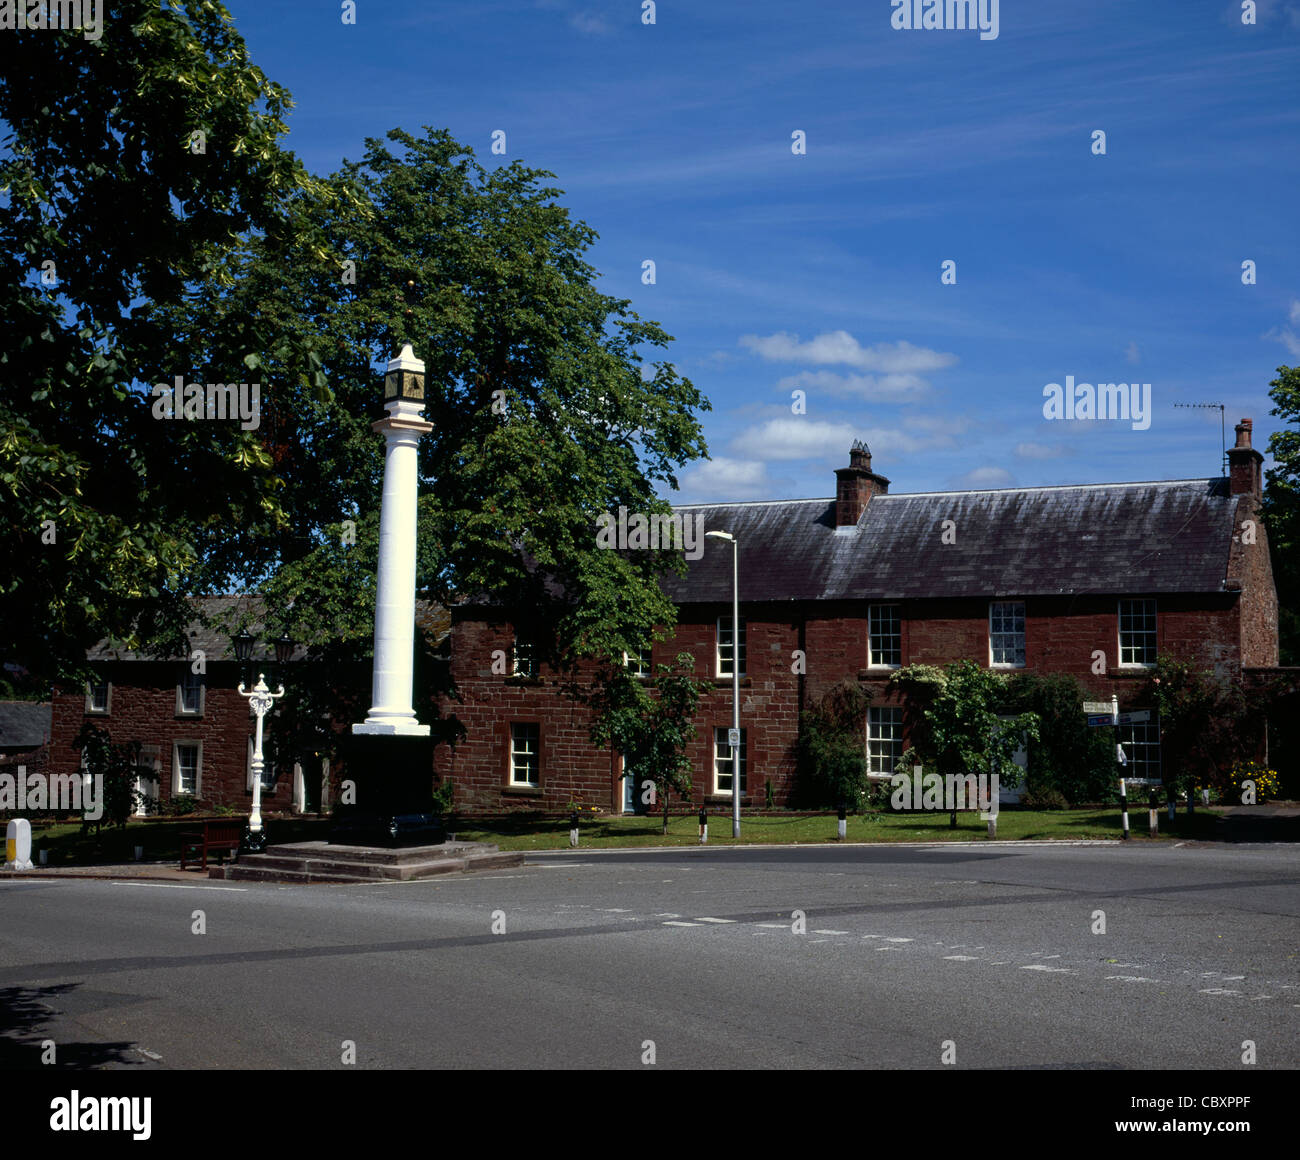 The High Cross Boroughgate Appleby-in-Westmorland Cumbria England - Stock Image